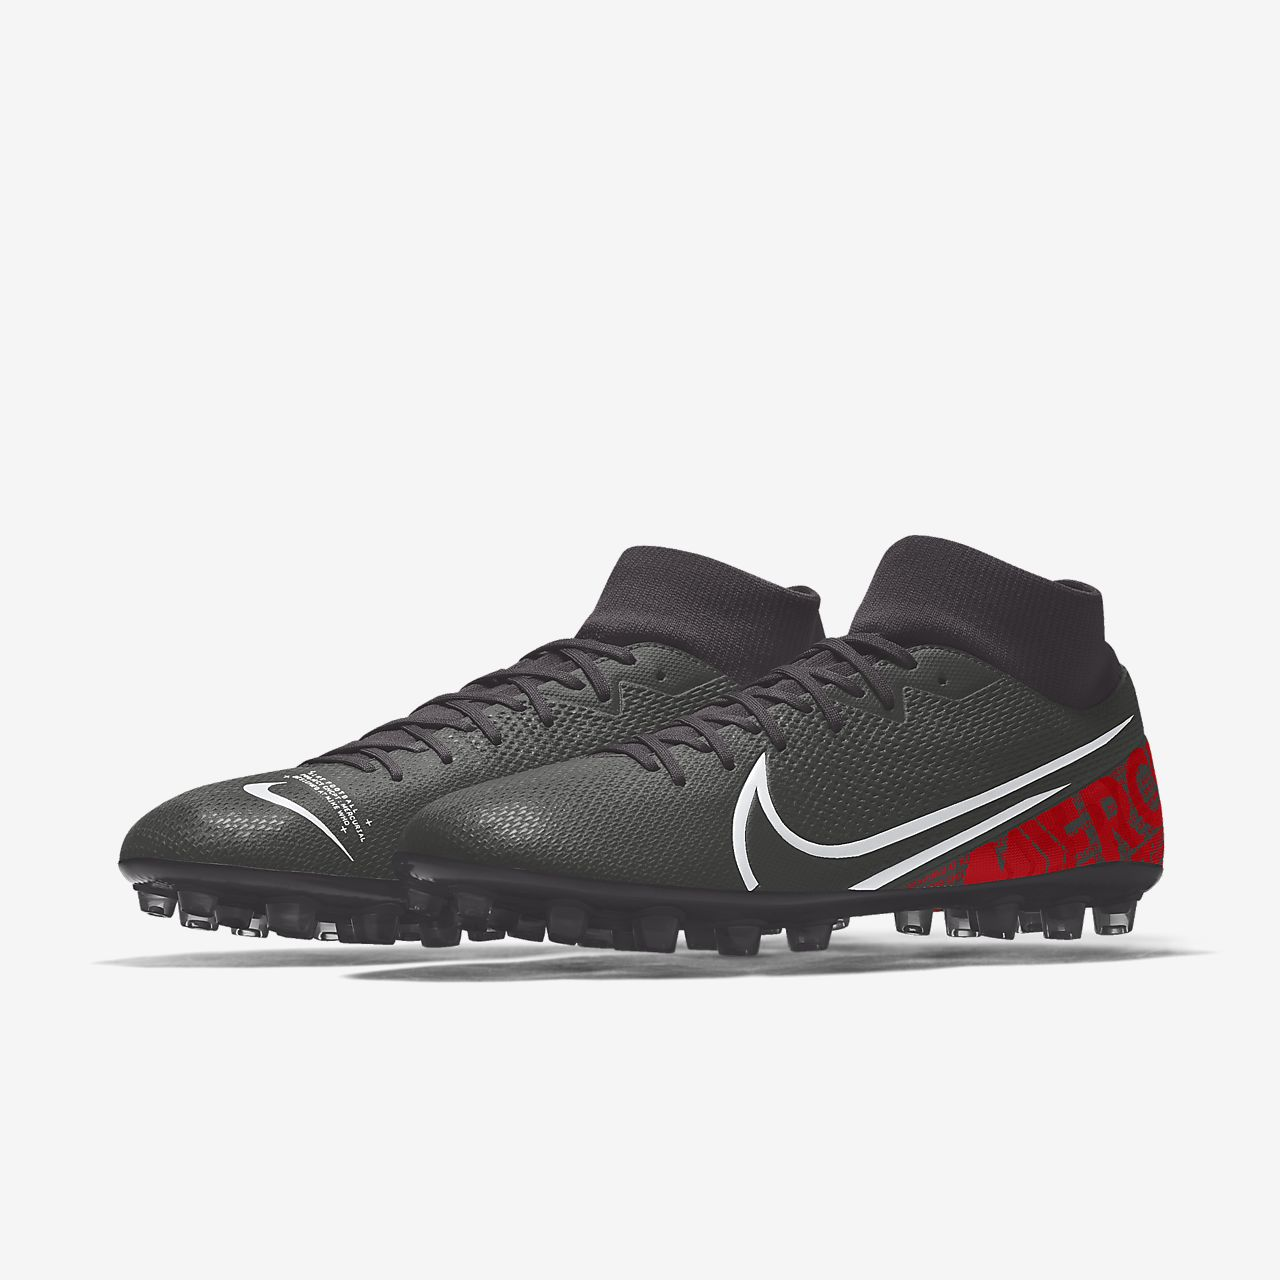 Nike Mercurial Superfly 7 Academy AG By You personalisierbarer Fußballschuh für Kunstrasen